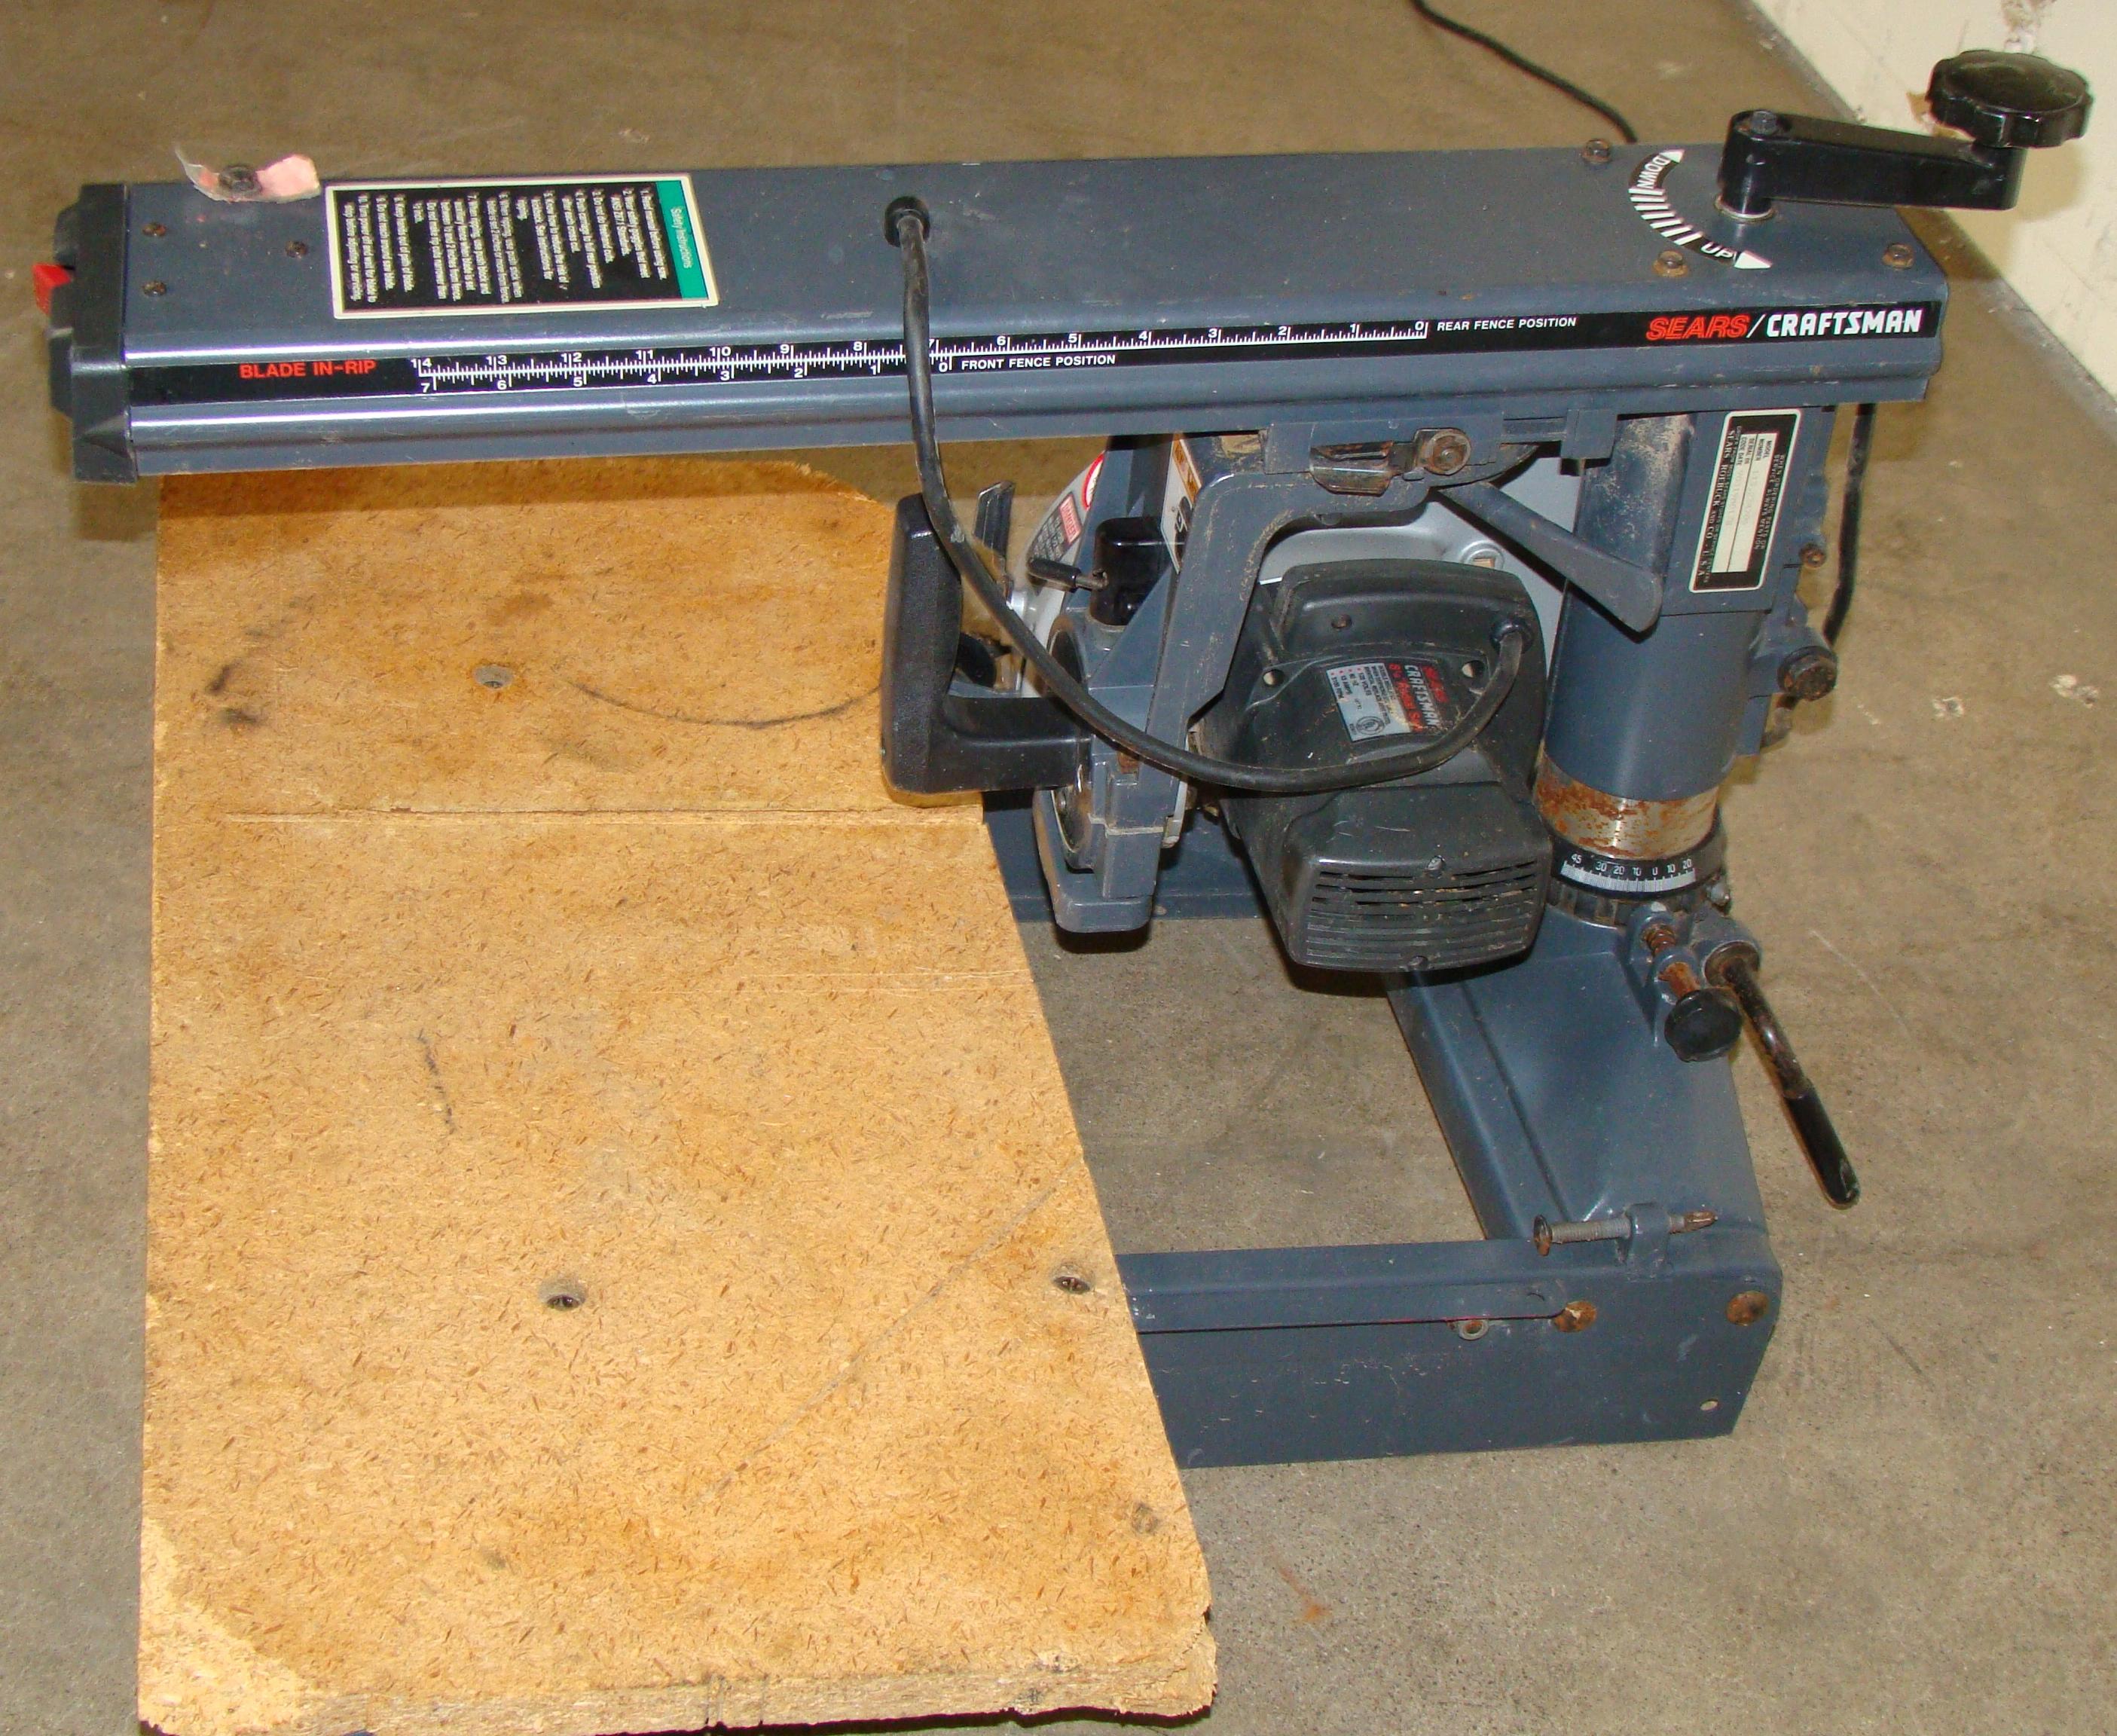 "Craftsman 8-1/4"" Radial Arm Saw 120 Volt - Image 3 of 5"